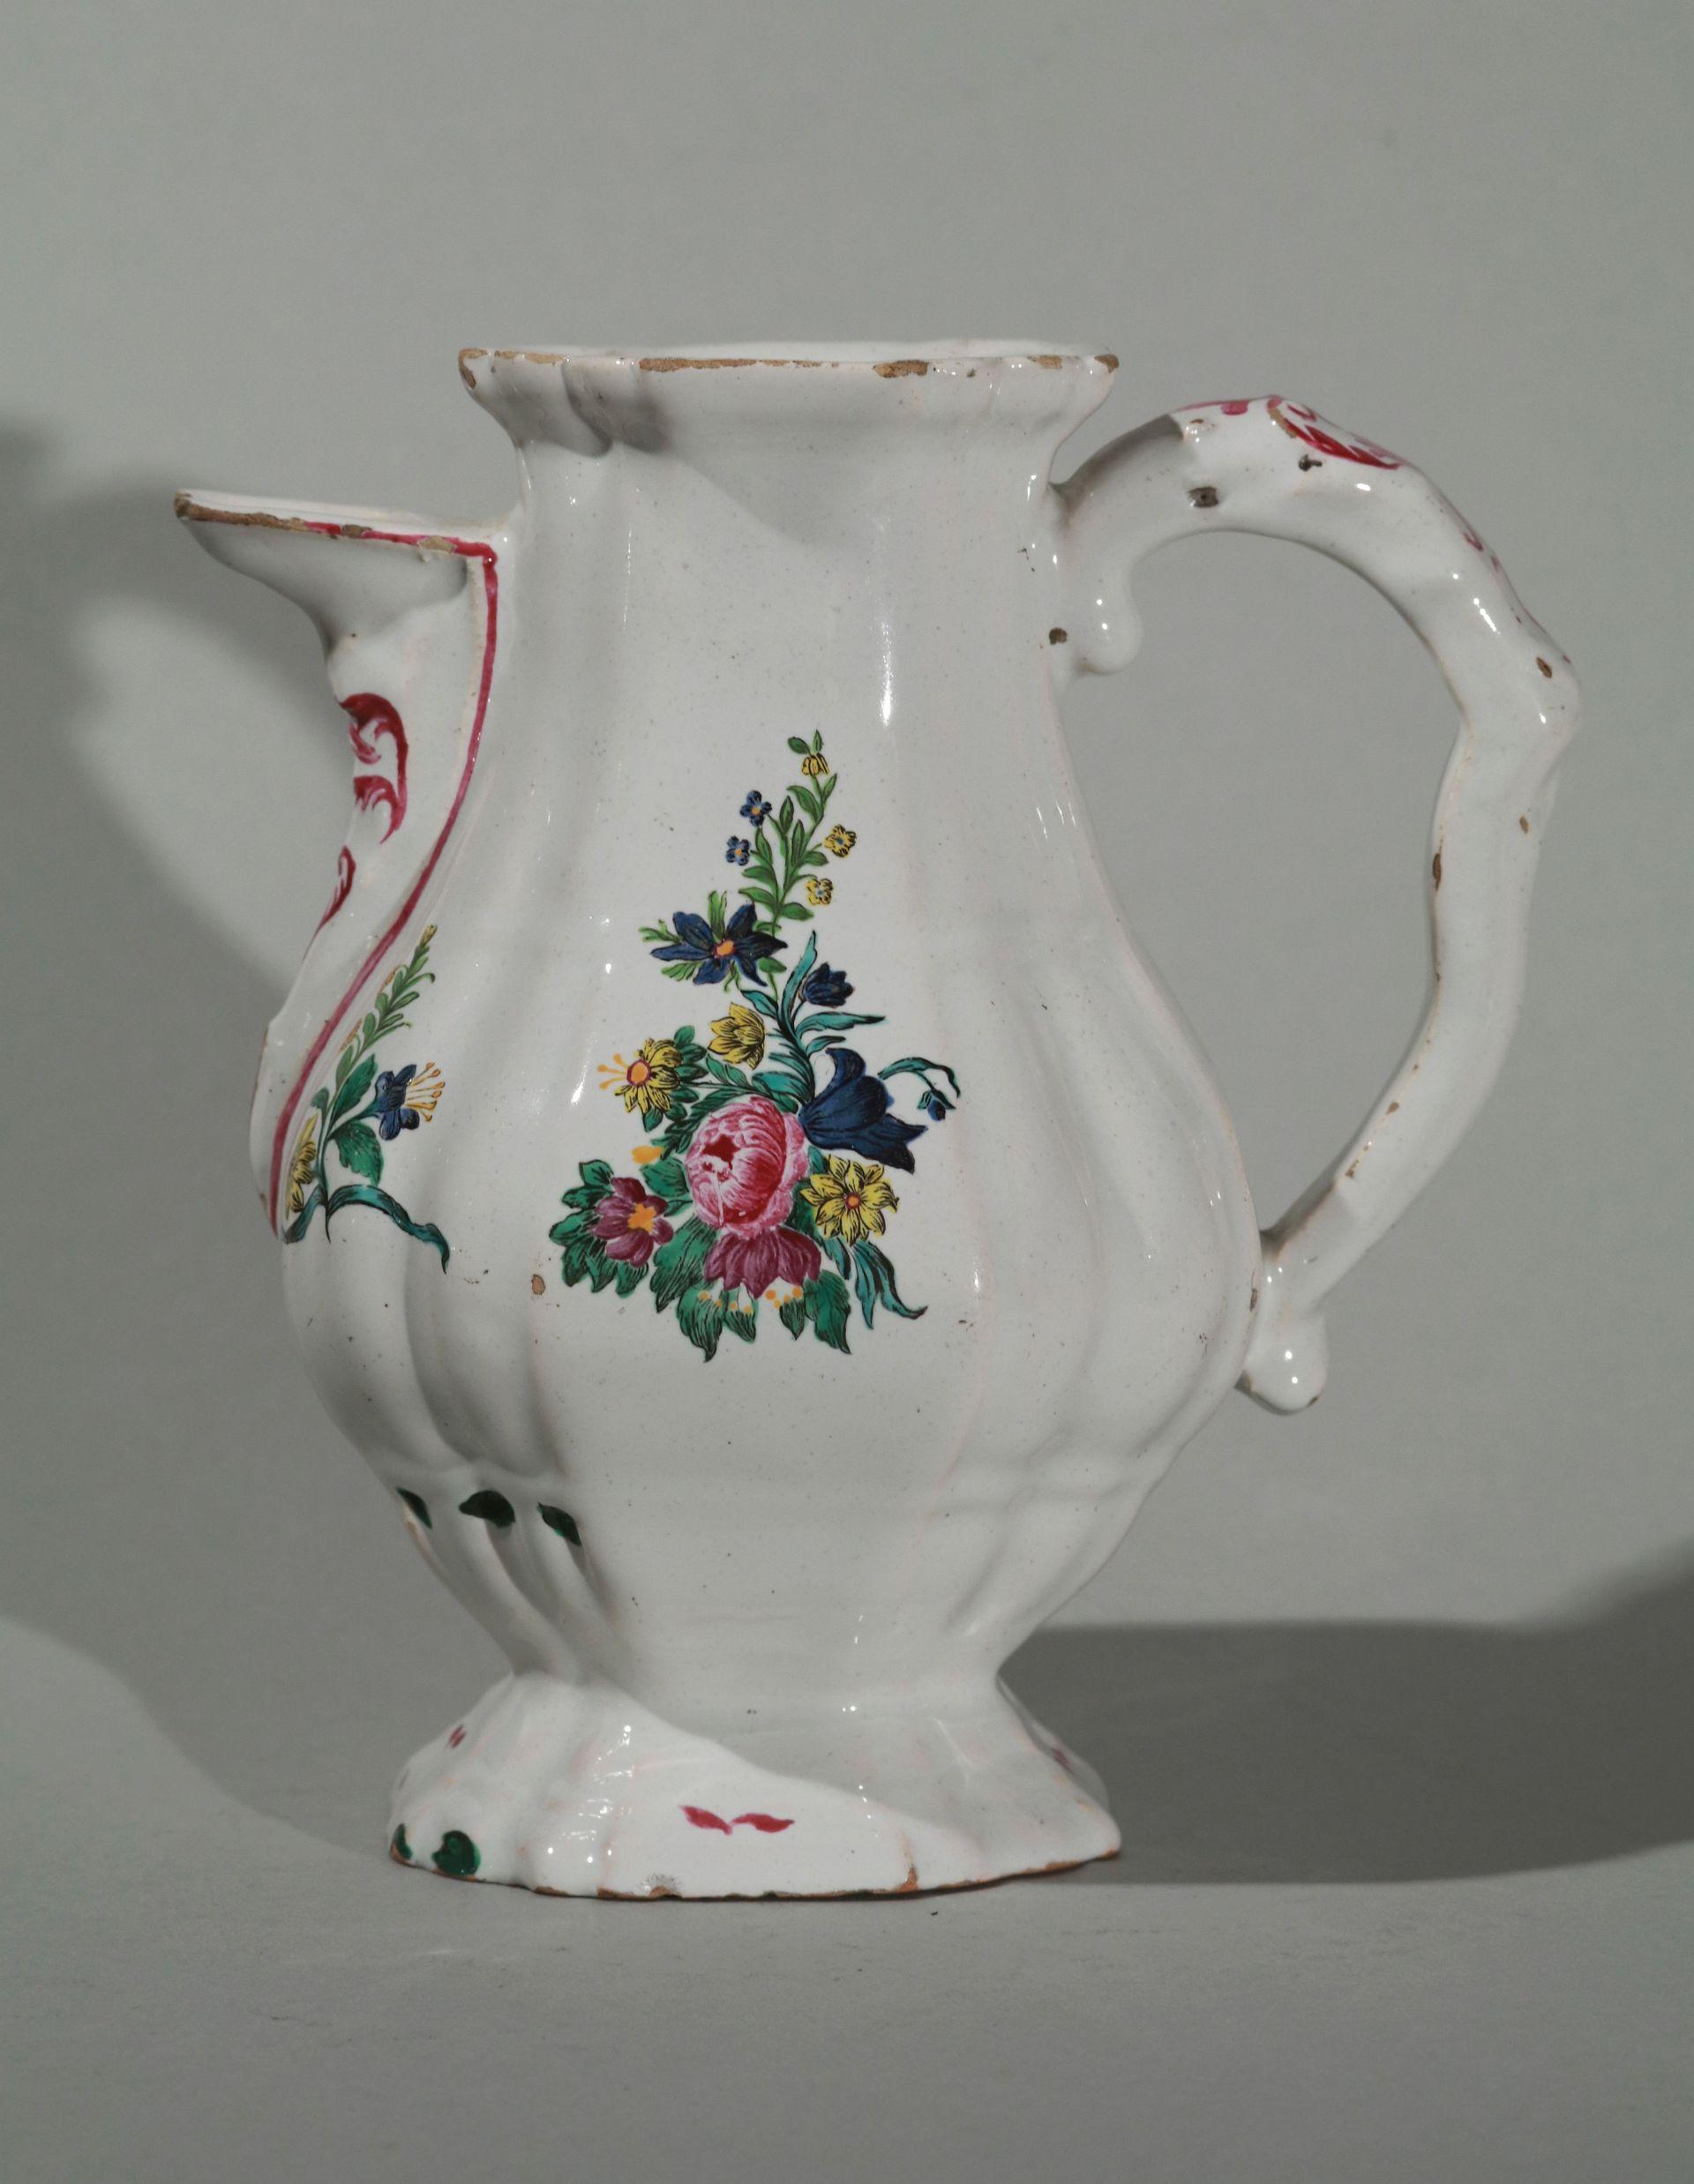 proskau-fayence-kaffee-kanne-um-1780